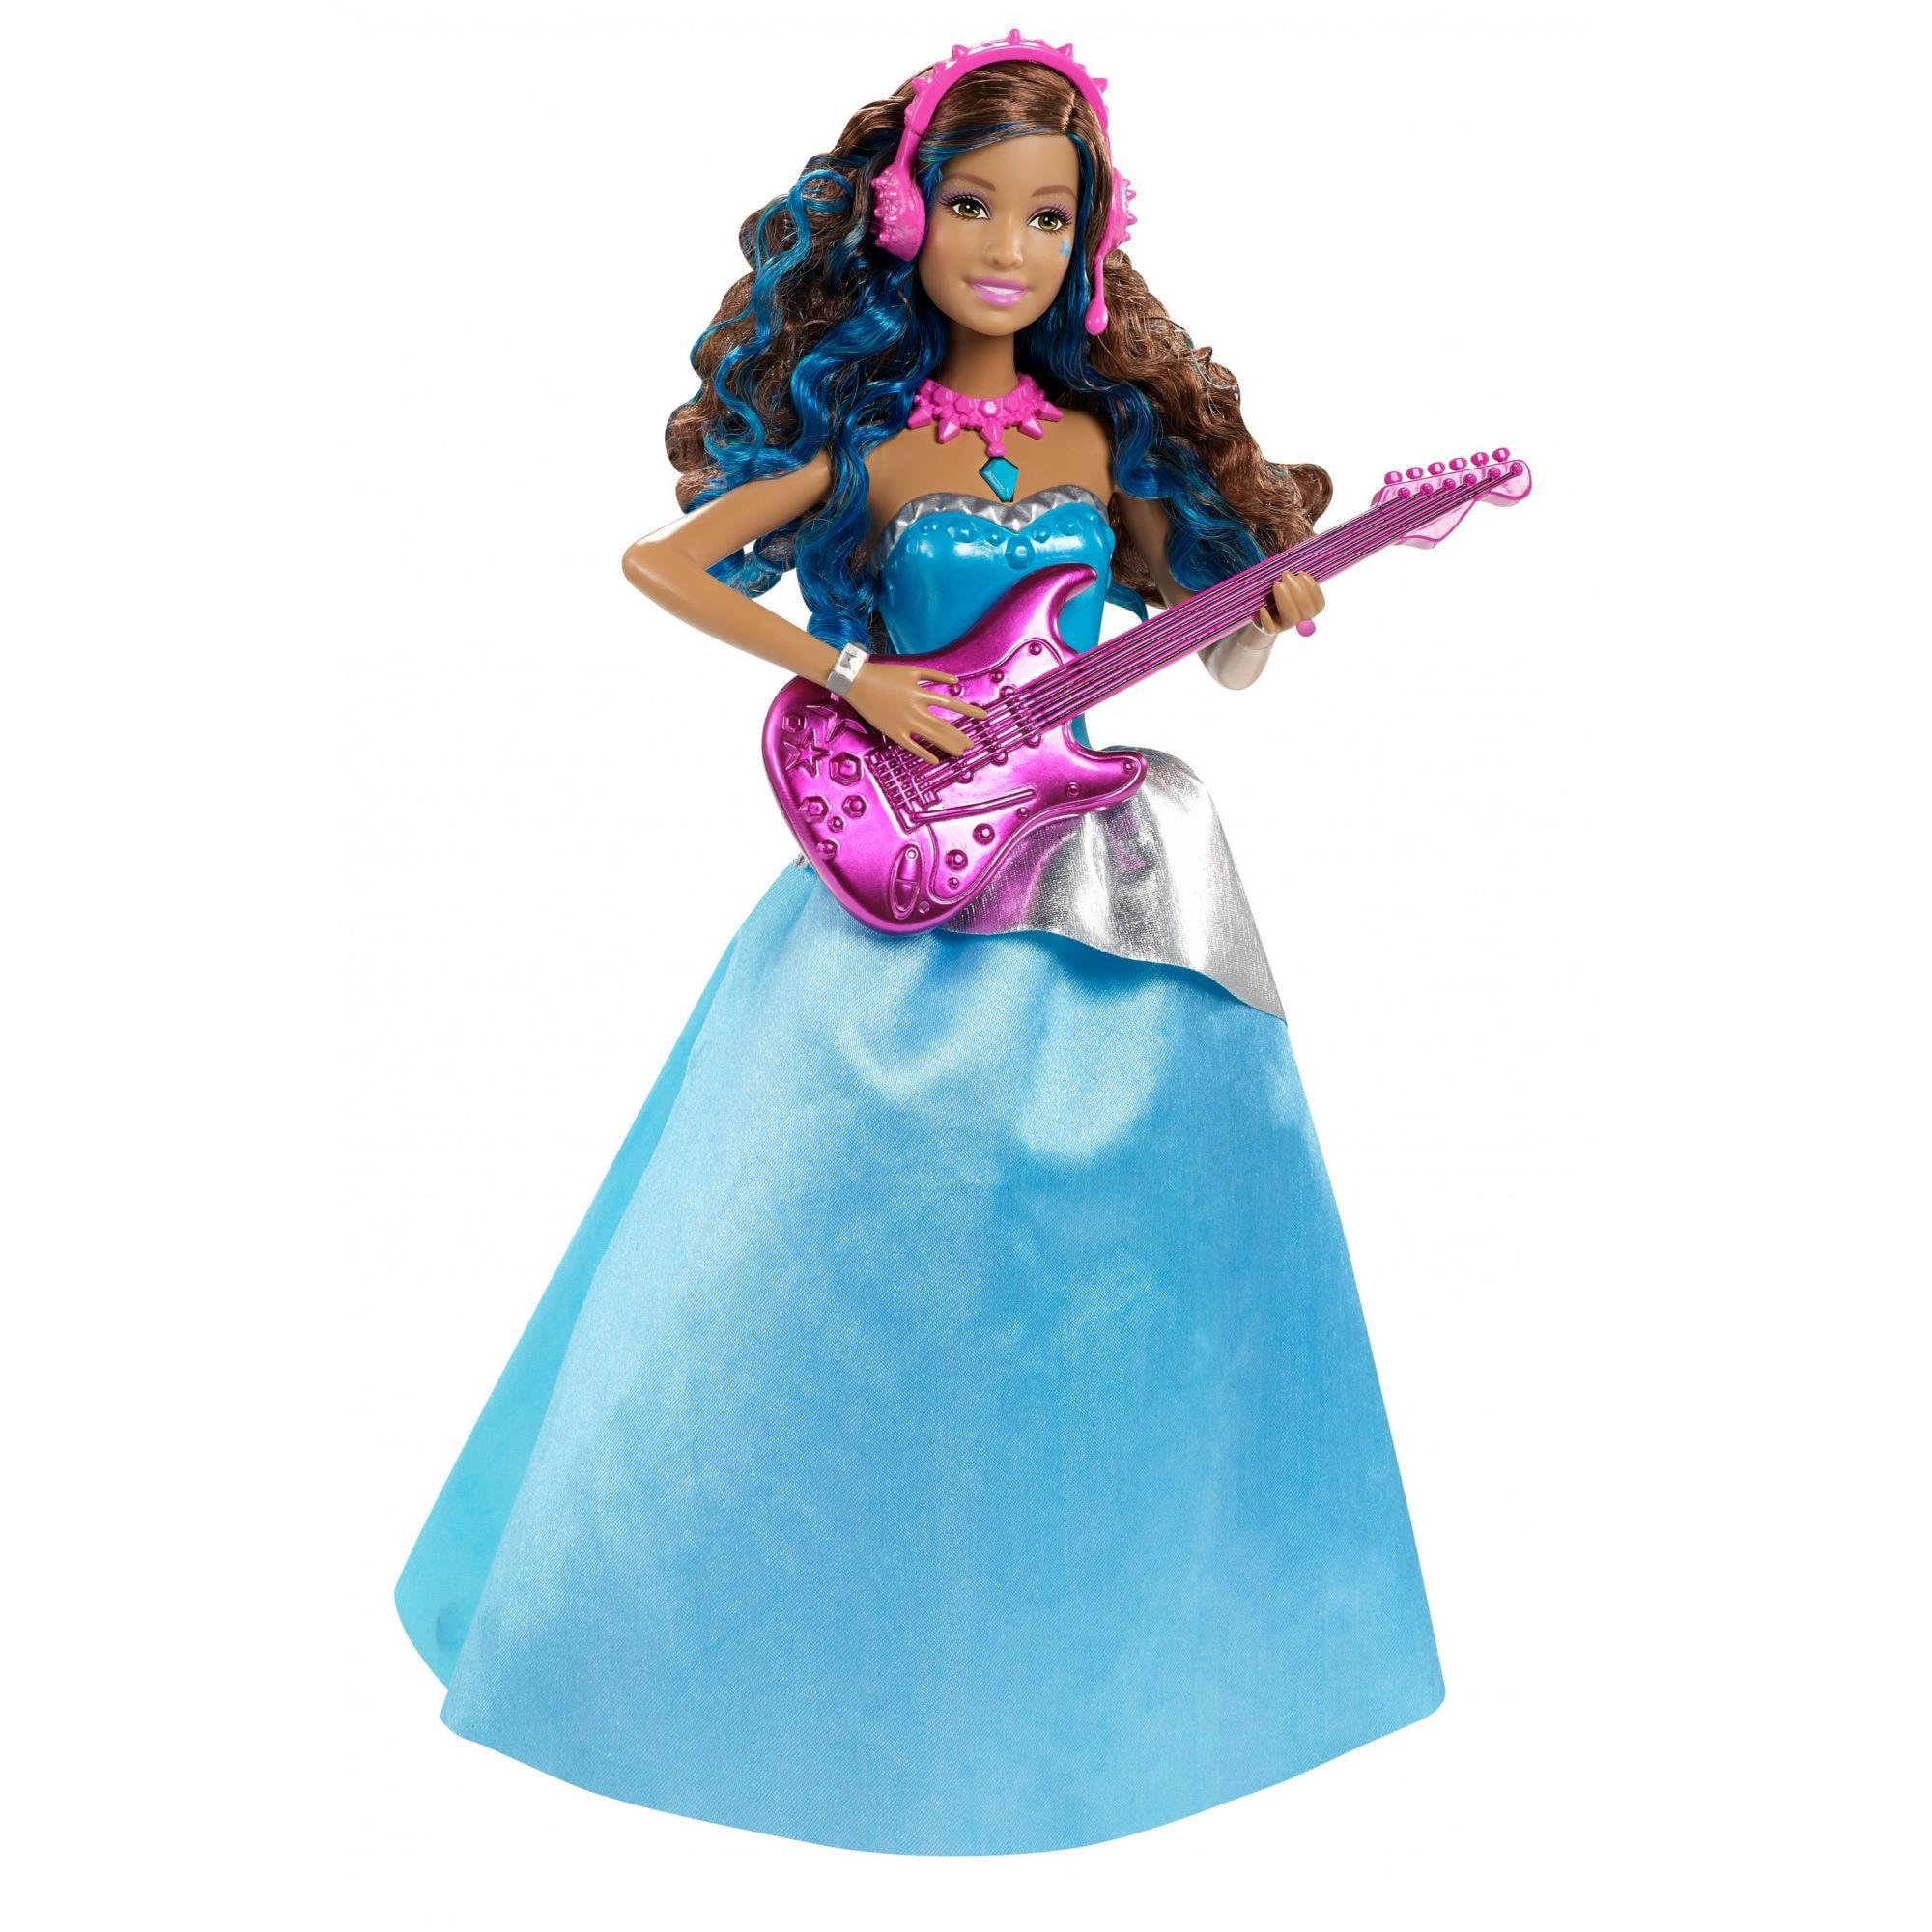 Barbie Rock N Royals Erika Doll - Walmart.com